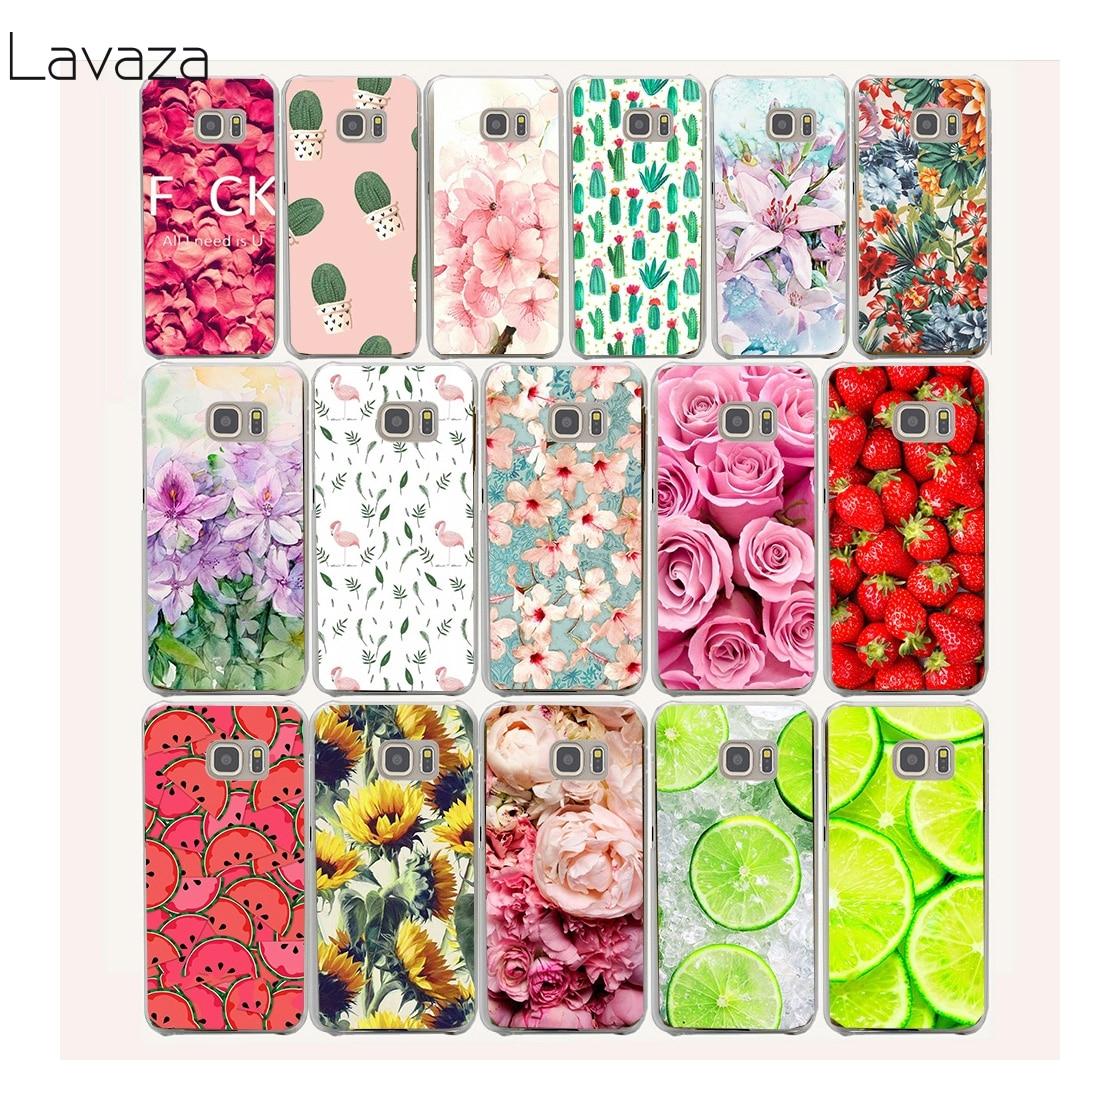 Flowers Daisy Plants Fruit Hard Transparent Case Cover for Galaxy S3 S4 S5 & Mini S6 S7 Edge Plus Case Cover